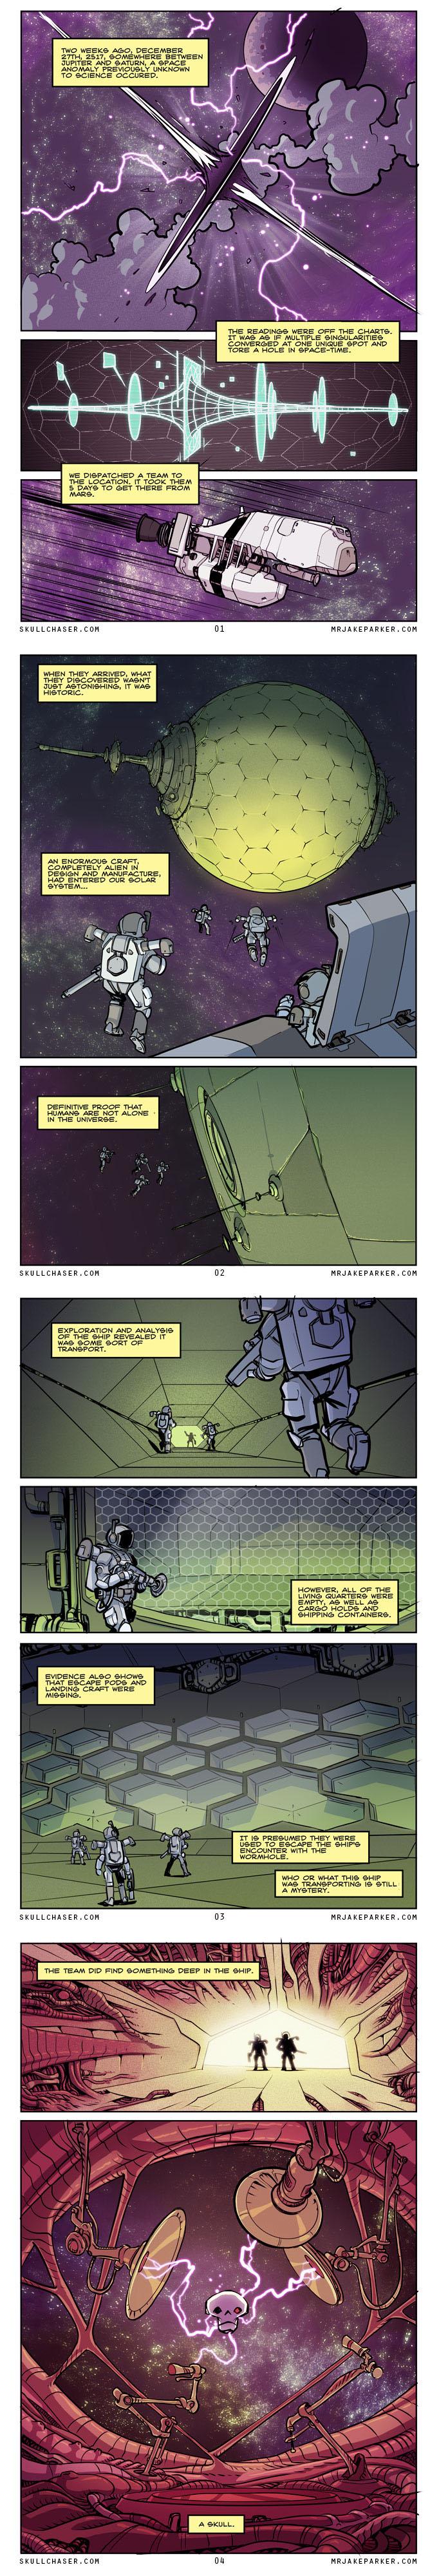 Skull Chaser Intro by JakeParker